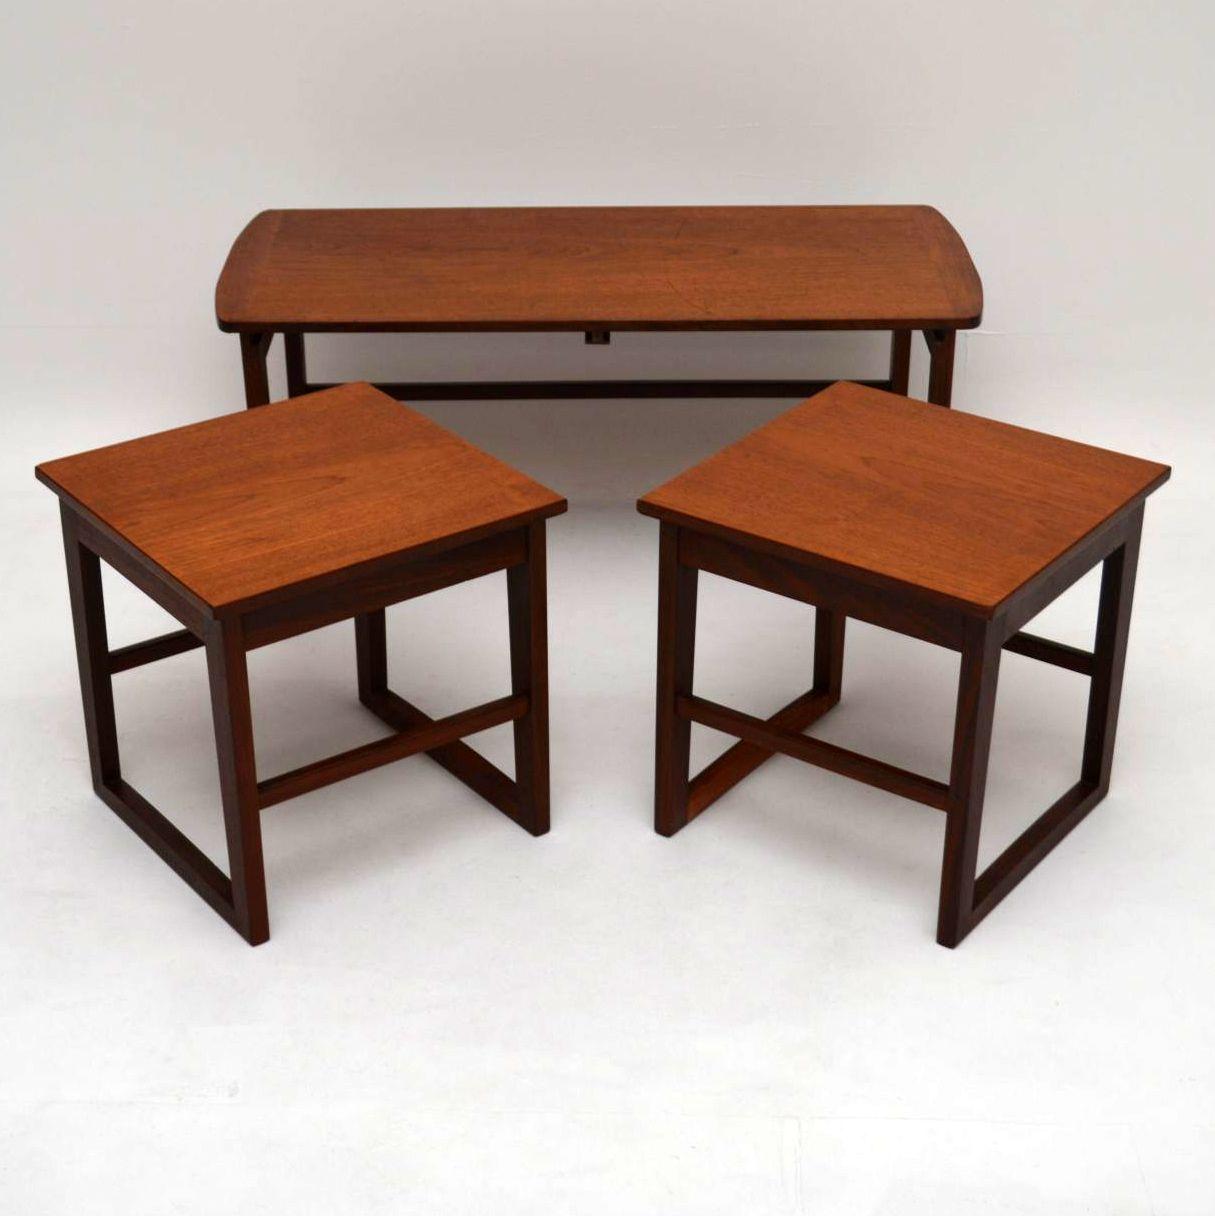 Retro Teak Nesting Coffee Table Vintage 1960s